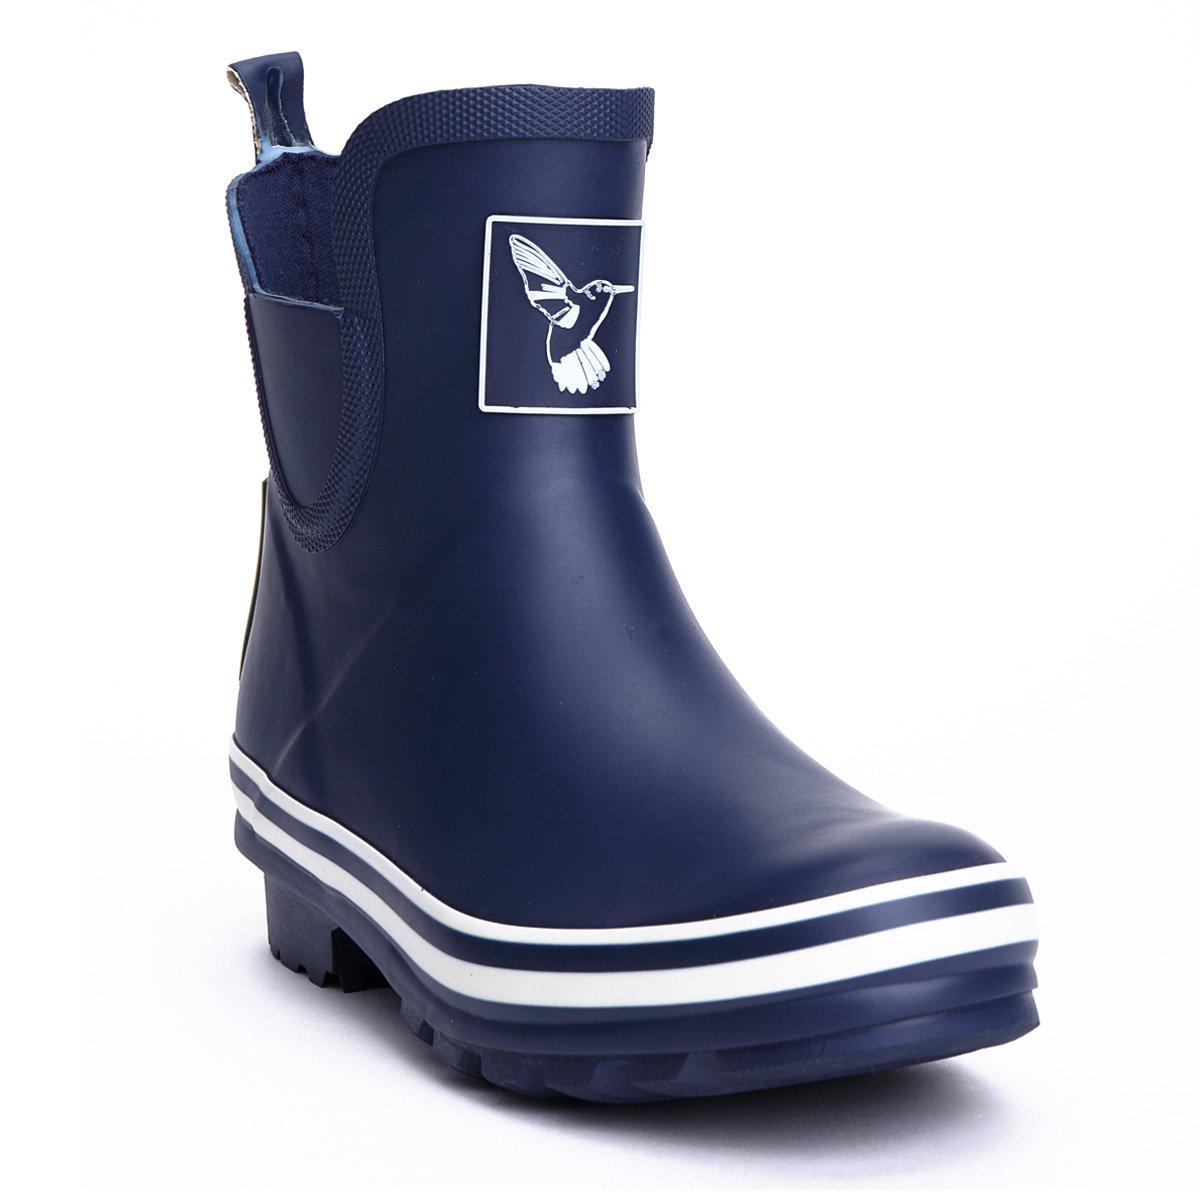 Evercreatures Women's Rain Boot Ankle Boots Meadow Wellies Garden Boot UK Brand B00TLXJ0L2 7 B(M) US / UK5 / EU38 Blue_ Ankle